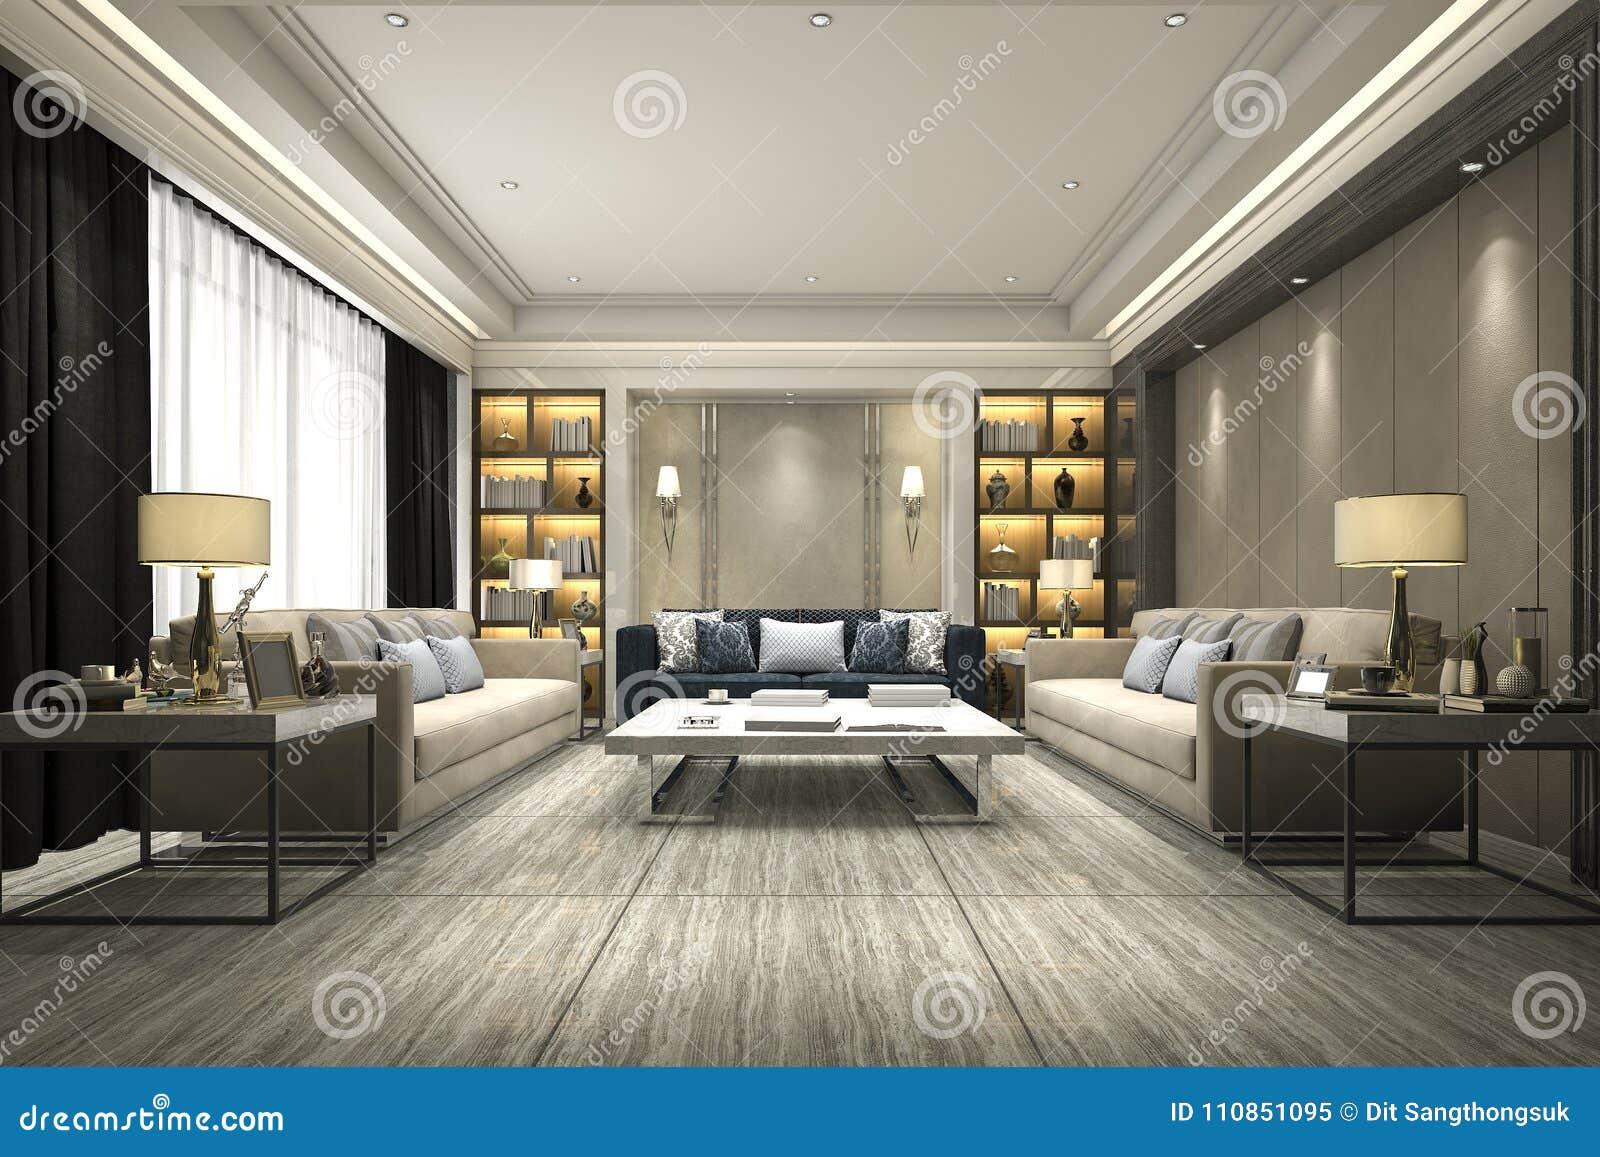 3d rendering luxury and modern living room with bookshelf stock illustration illustration of. Black Bedroom Furniture Sets. Home Design Ideas